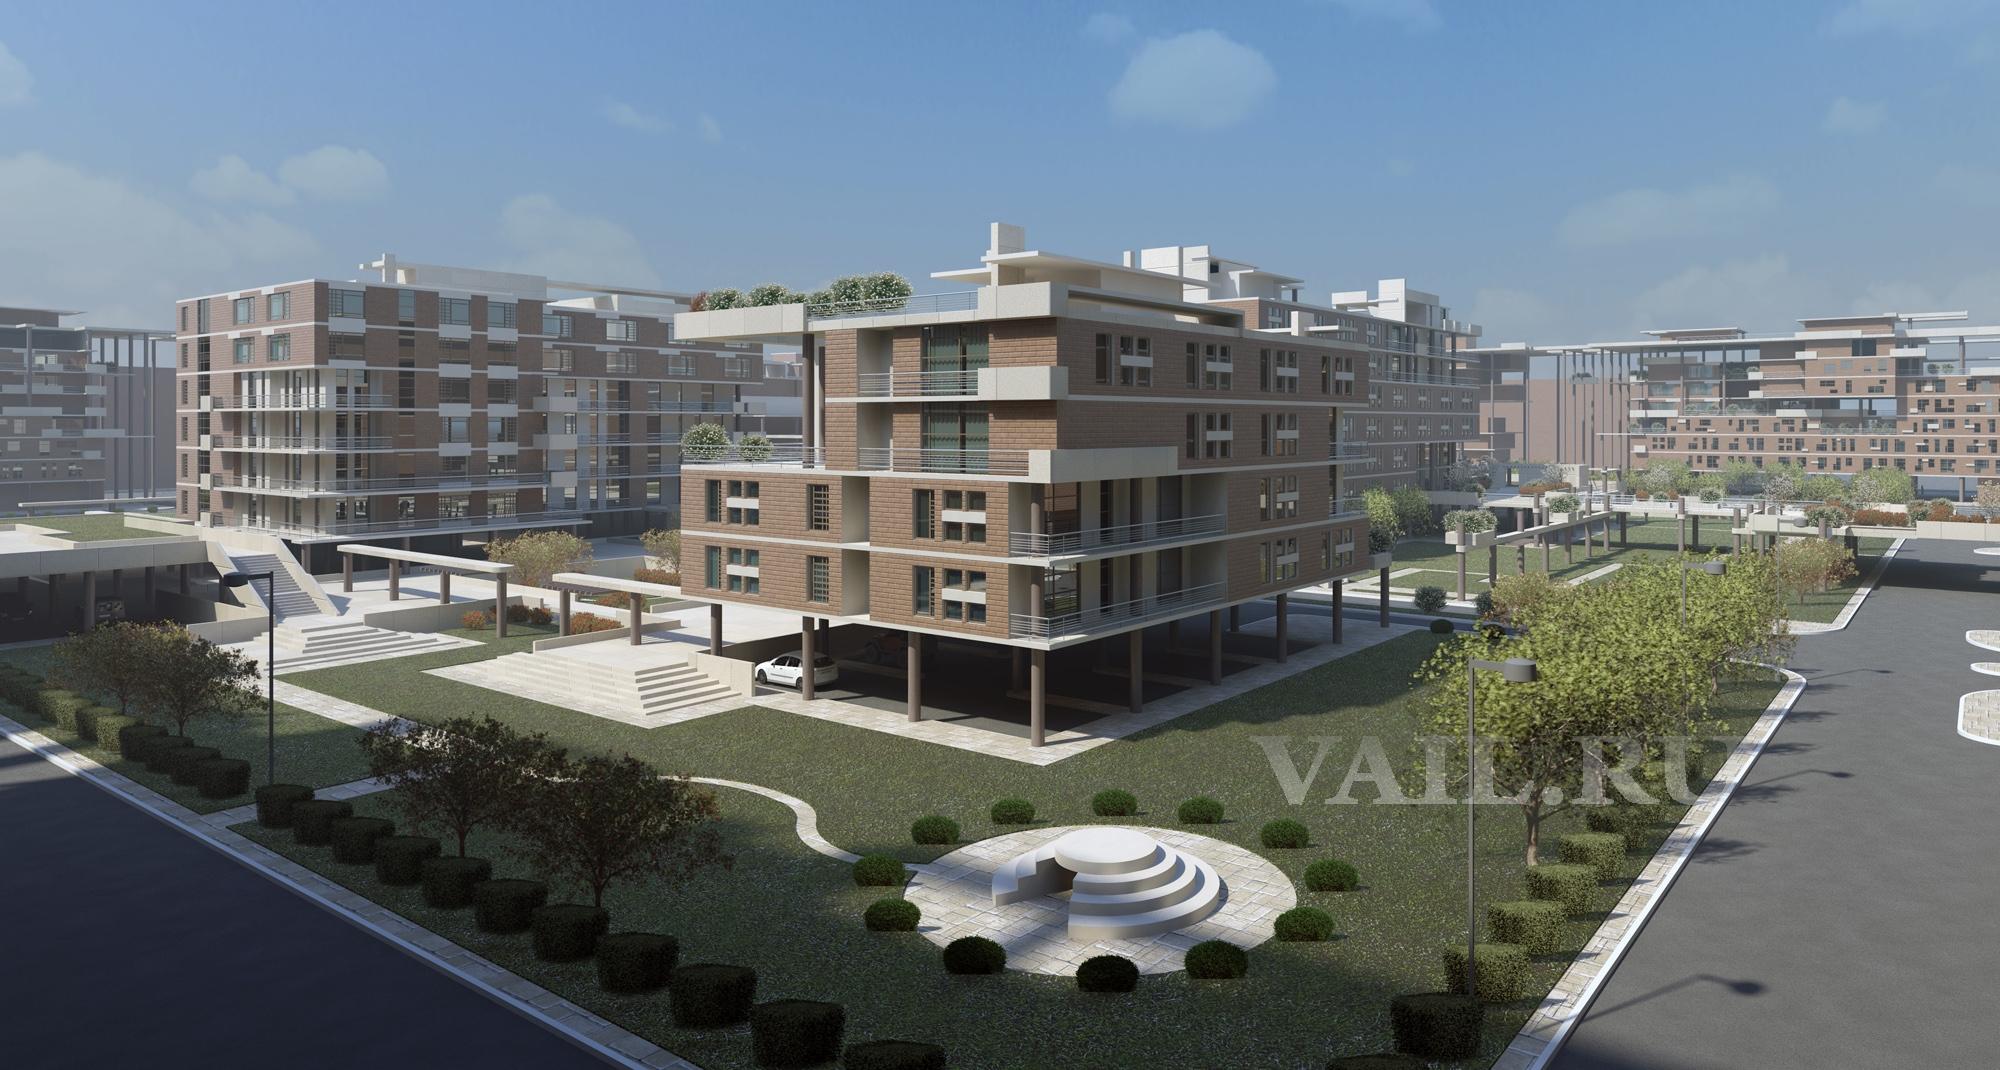 Проект жилого микрорайона в Новоситино. 2011 г.